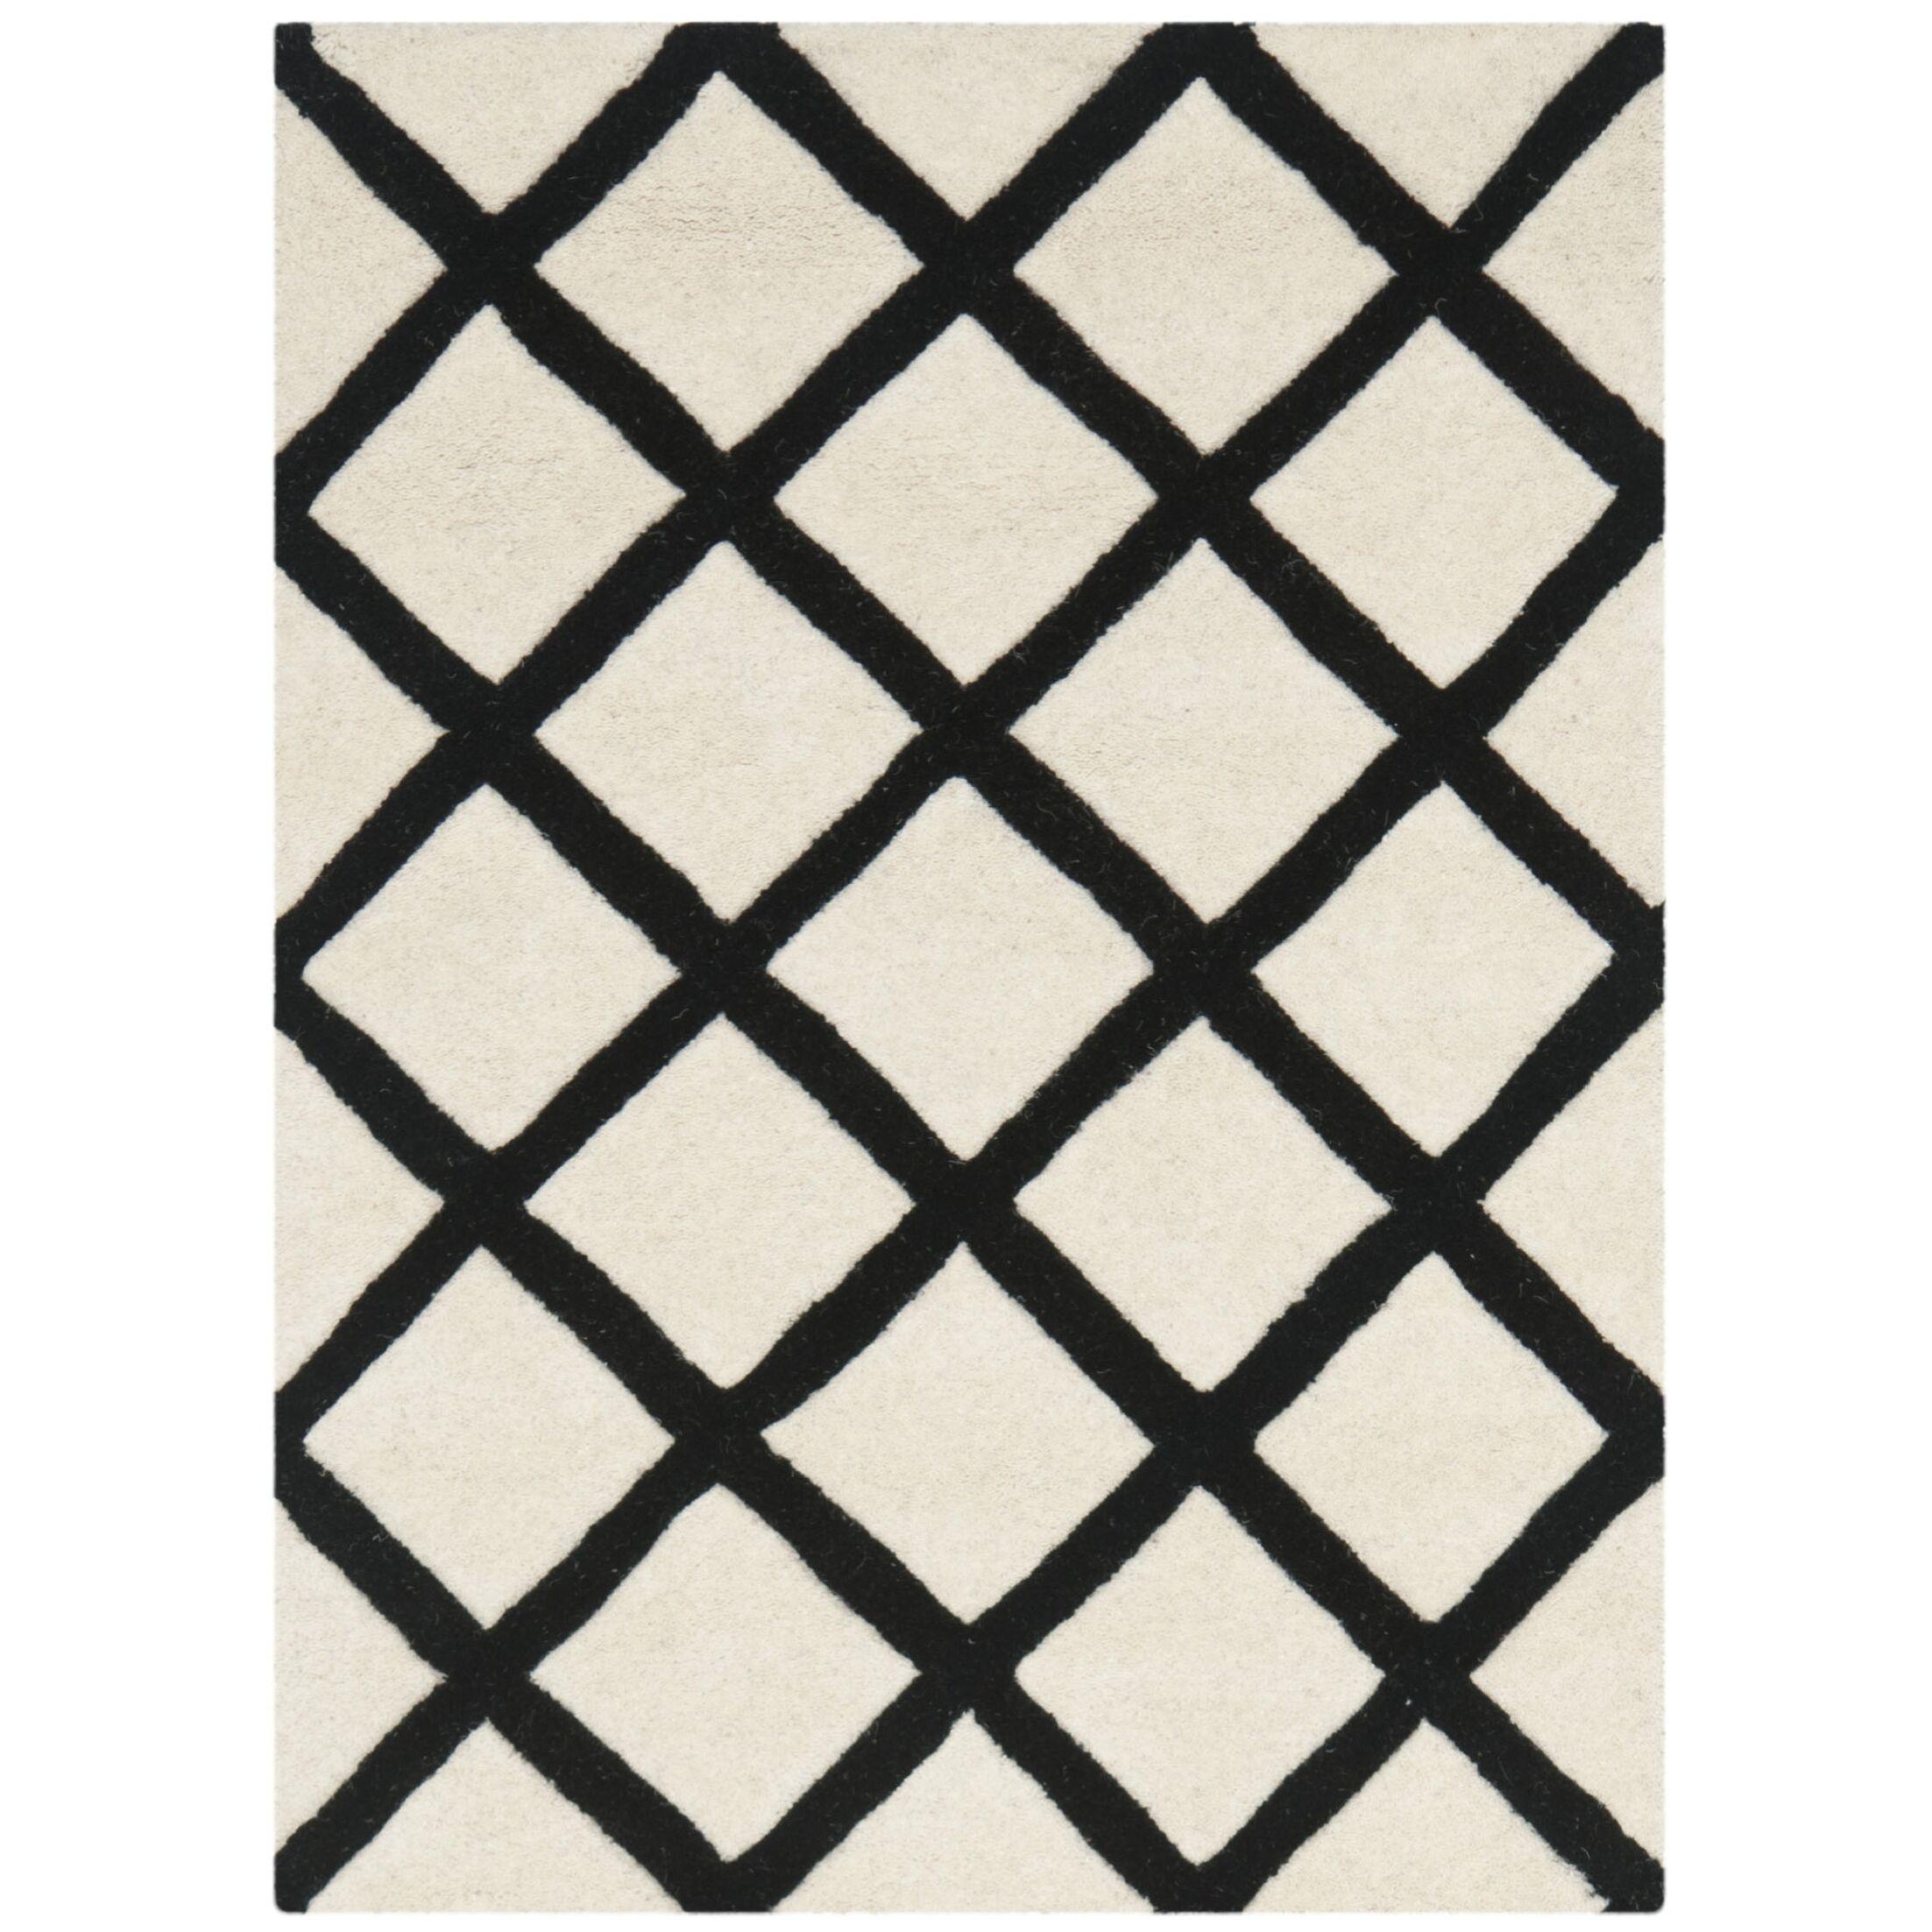 Wilkin Ivory & Black Area Rug Rug Size: Rectangle 6' x 9'